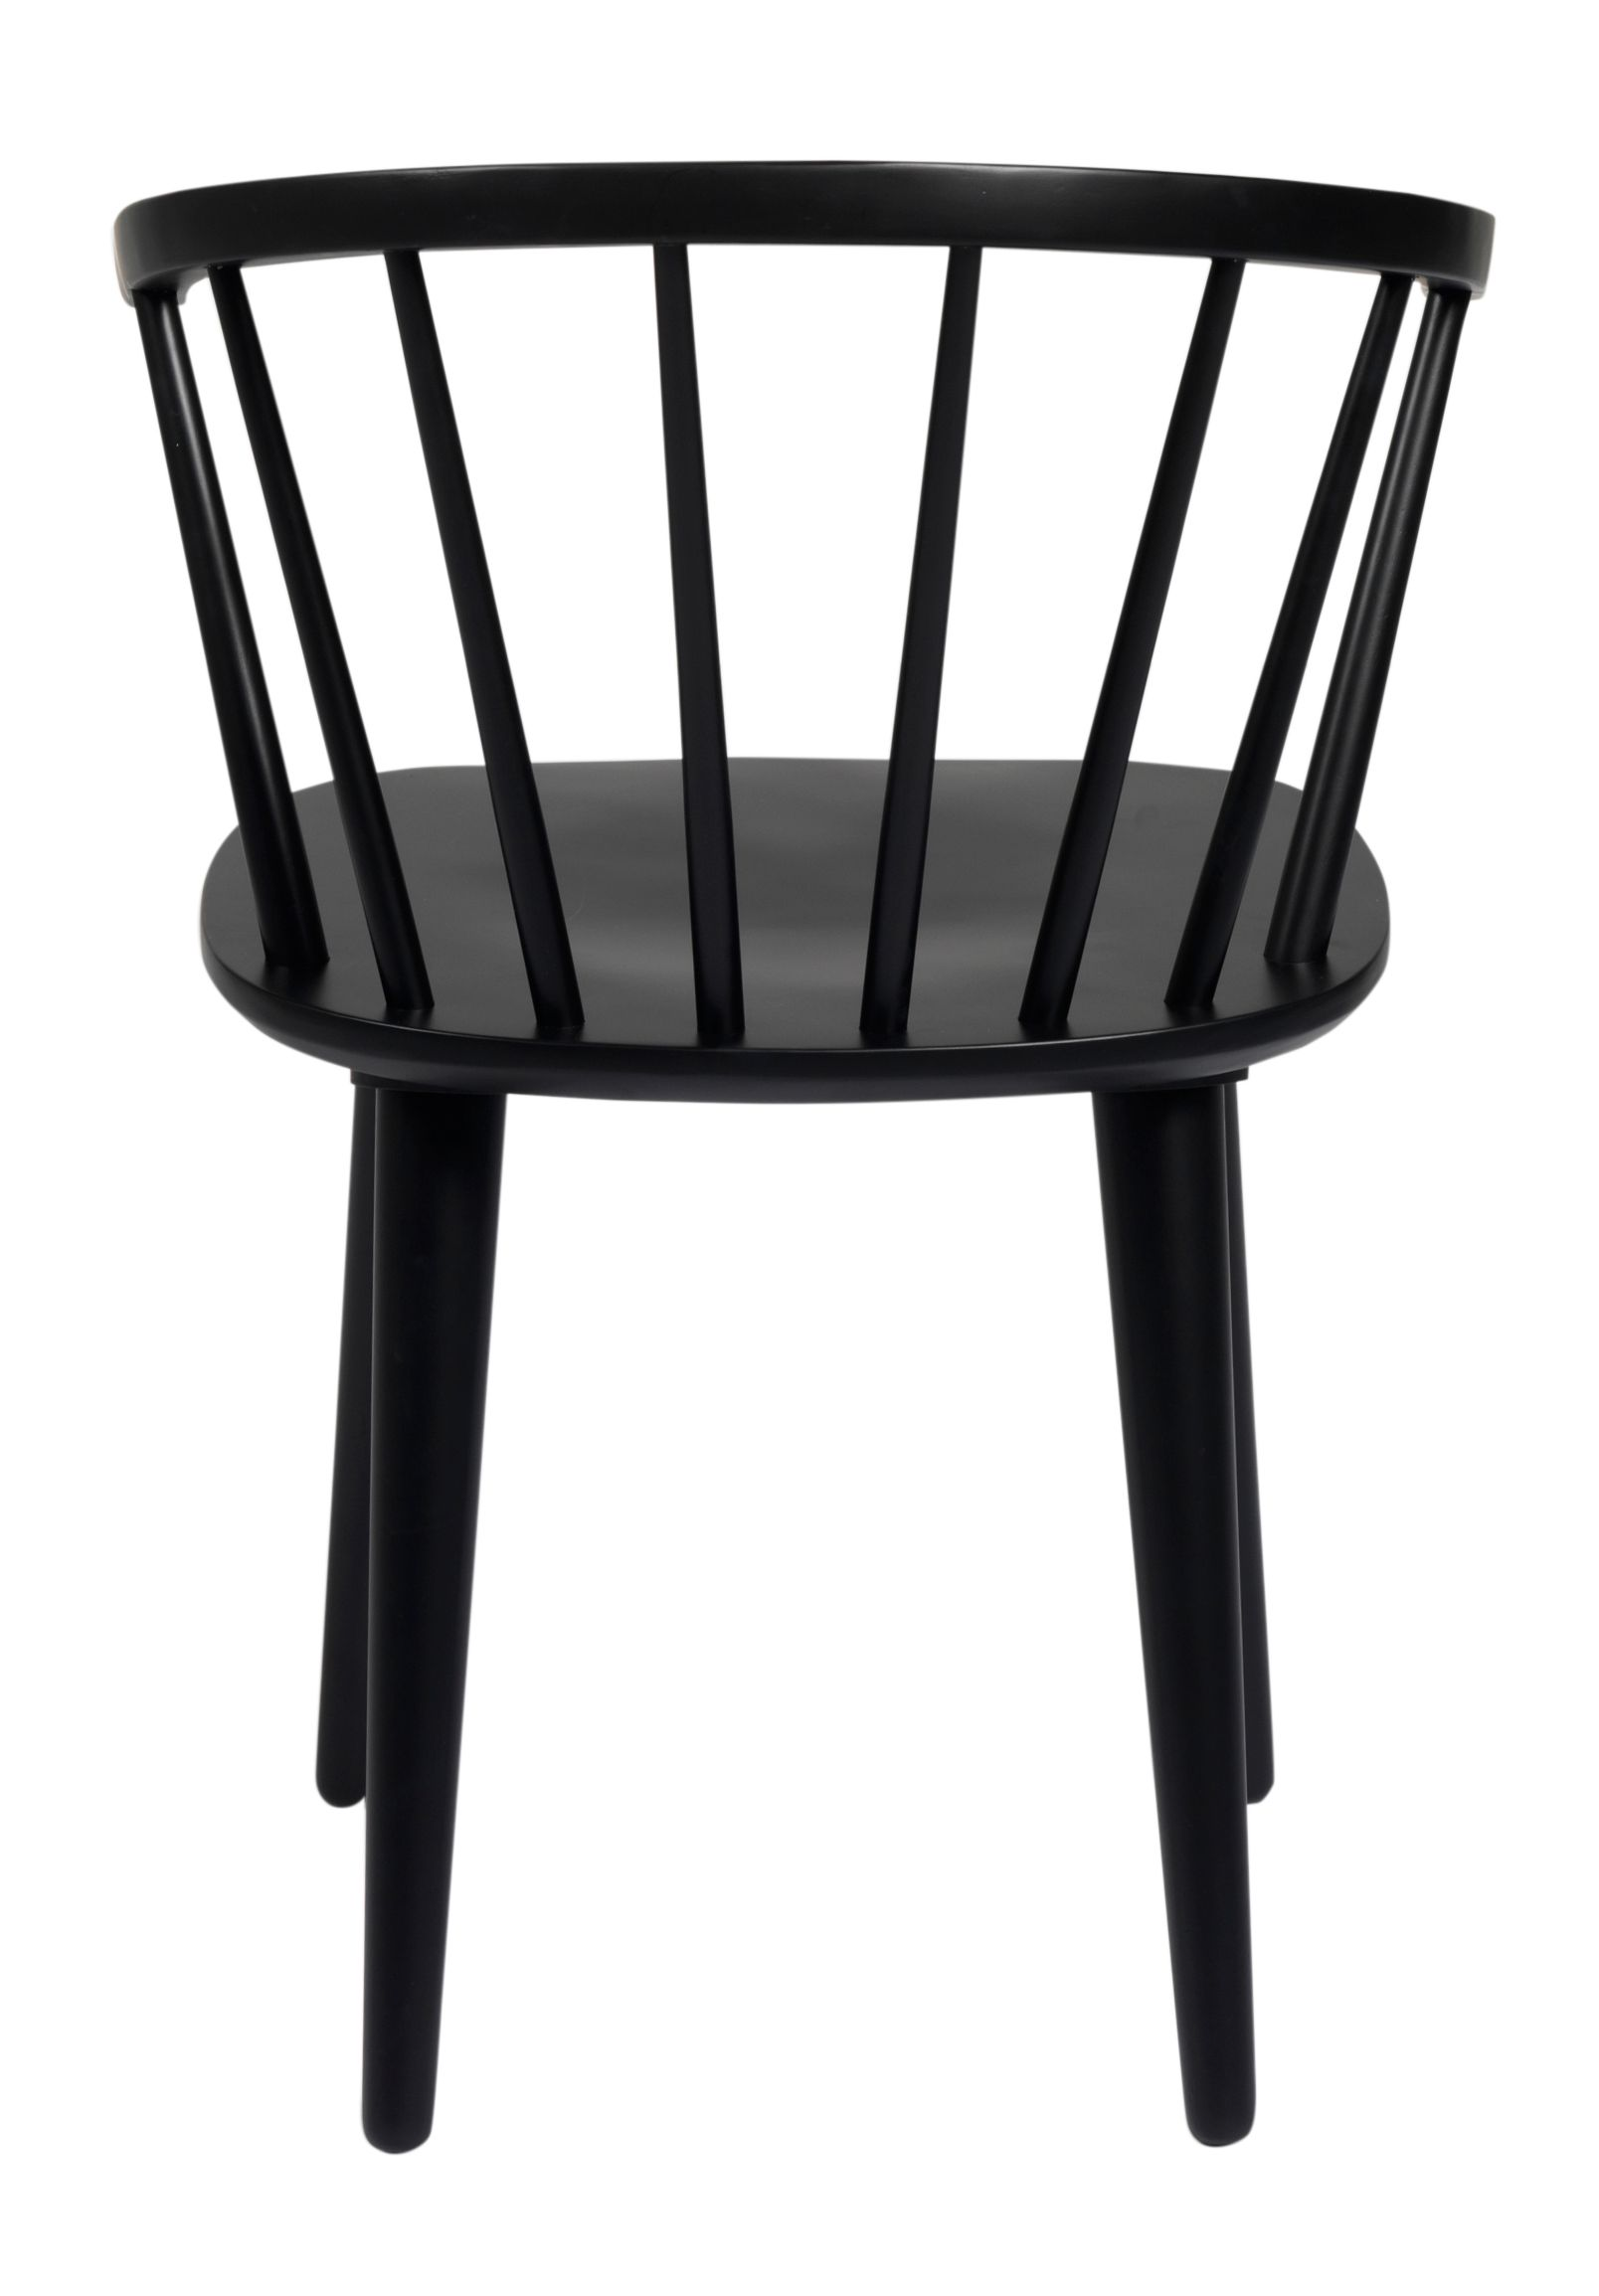 DAWSONE Carmen Black Chair